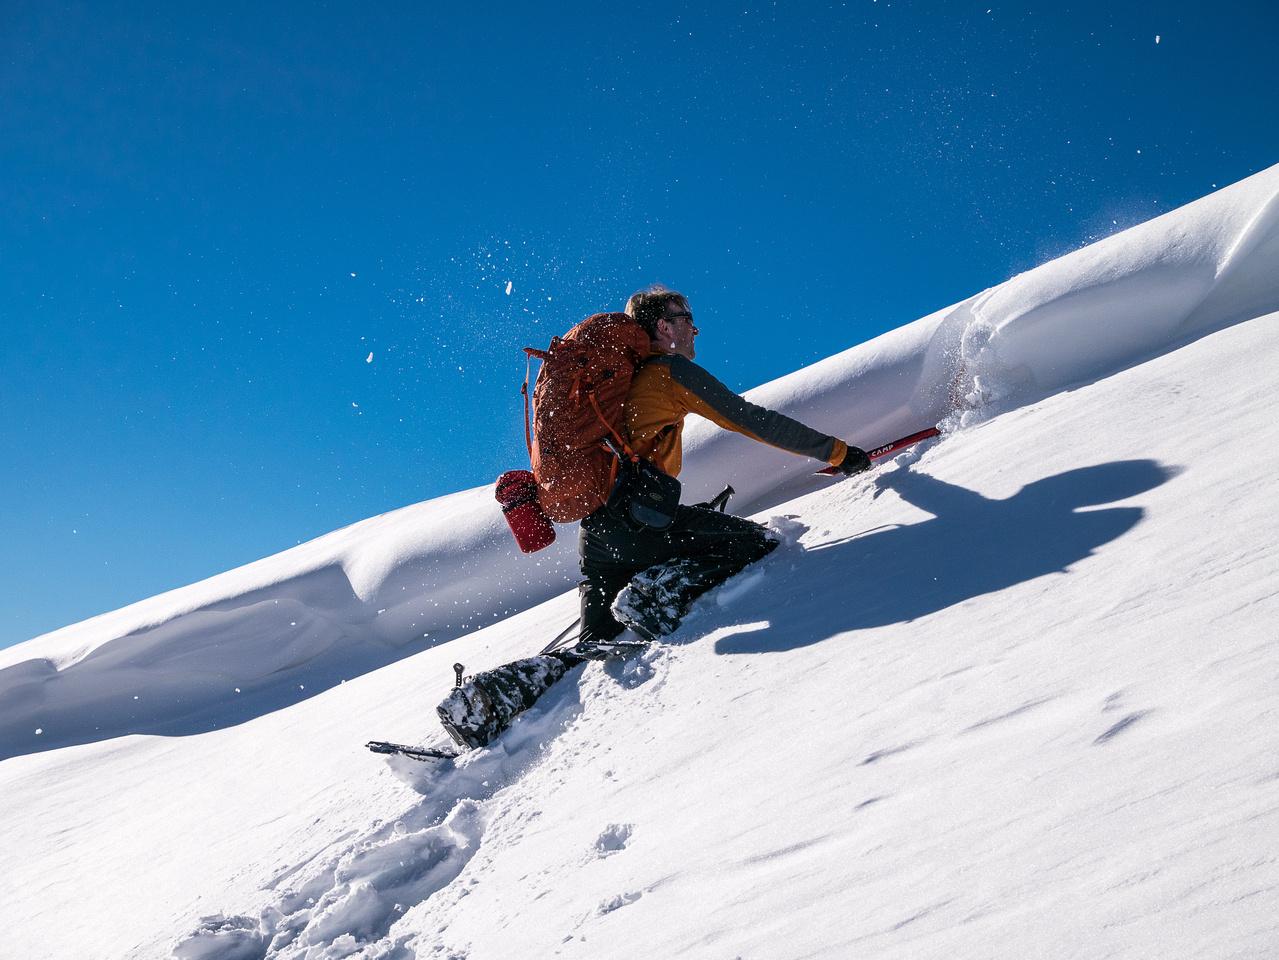 Raf chops through the cornice on the summit ridge.